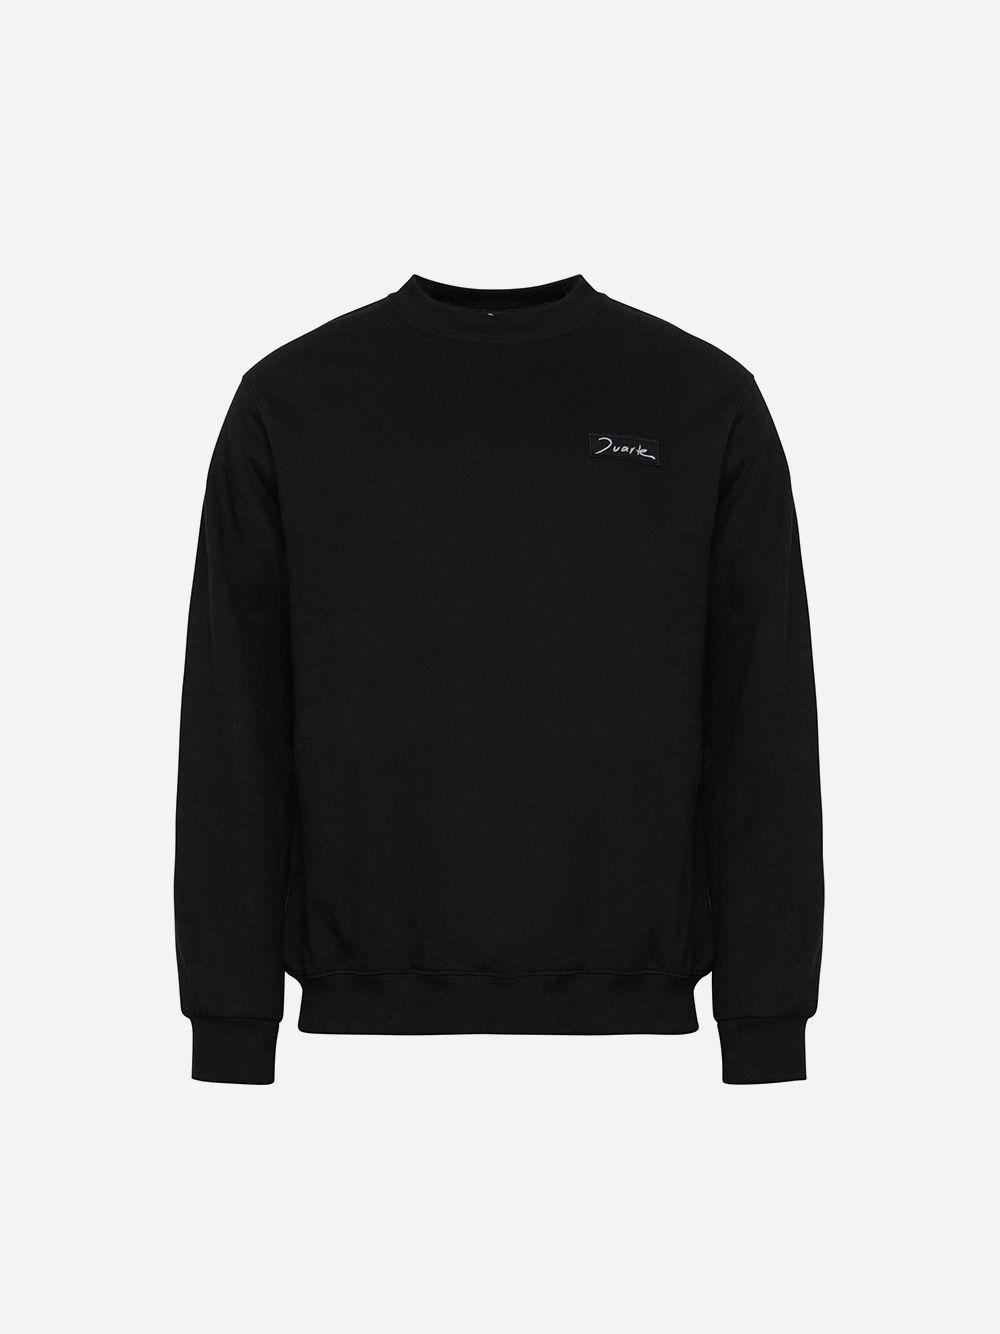 Sweatshirt Preta | Duarte